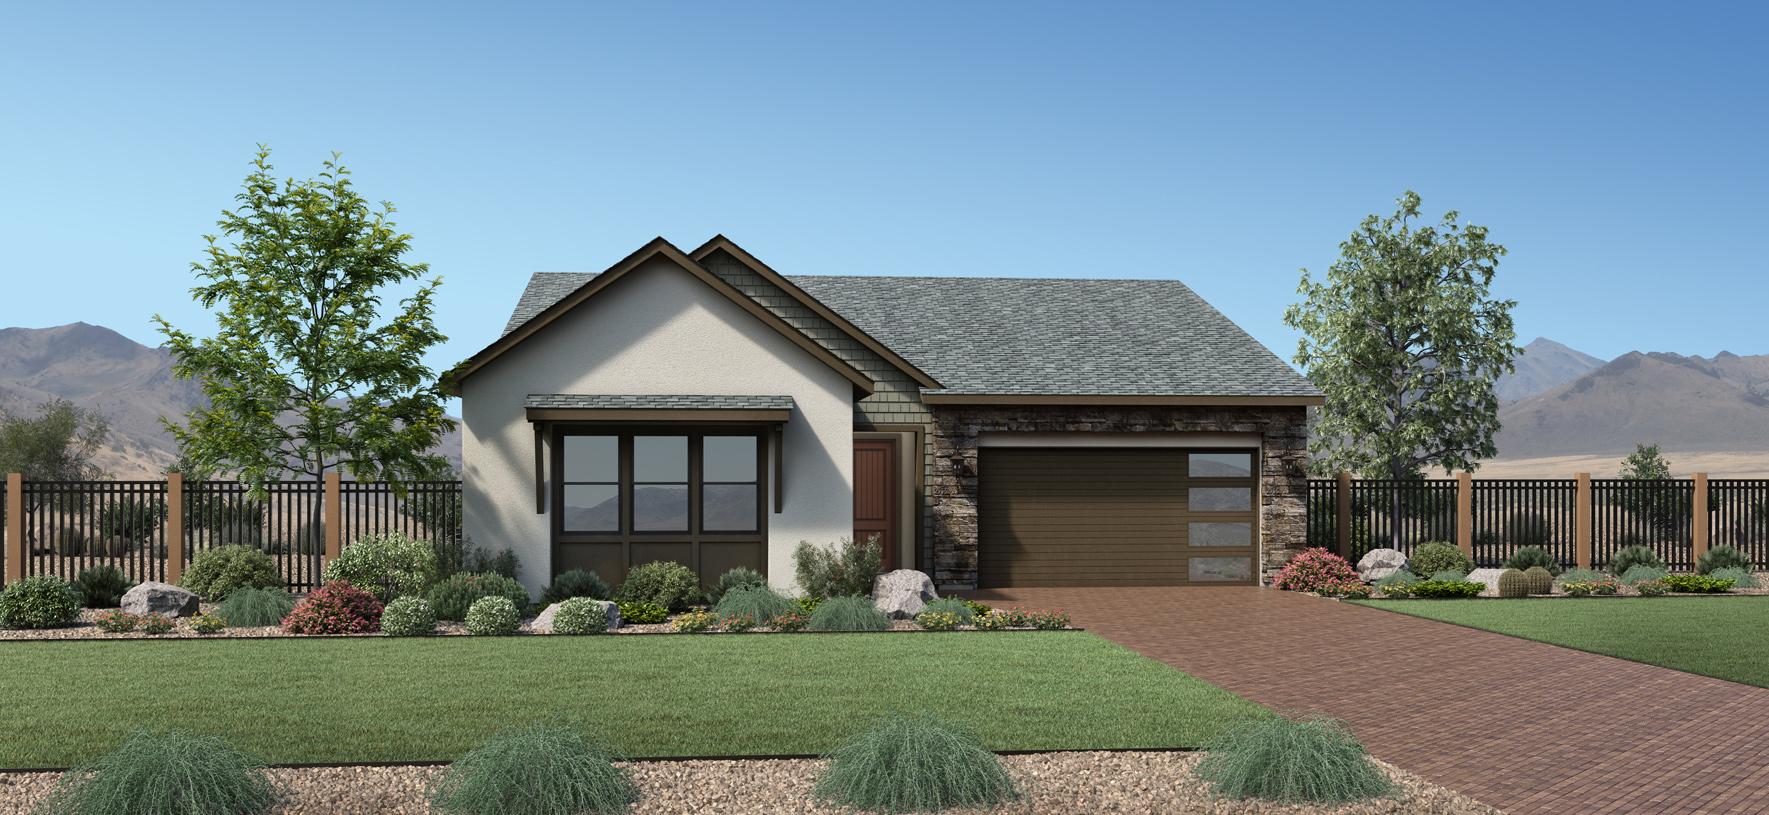 Addison -  Modern Ranch